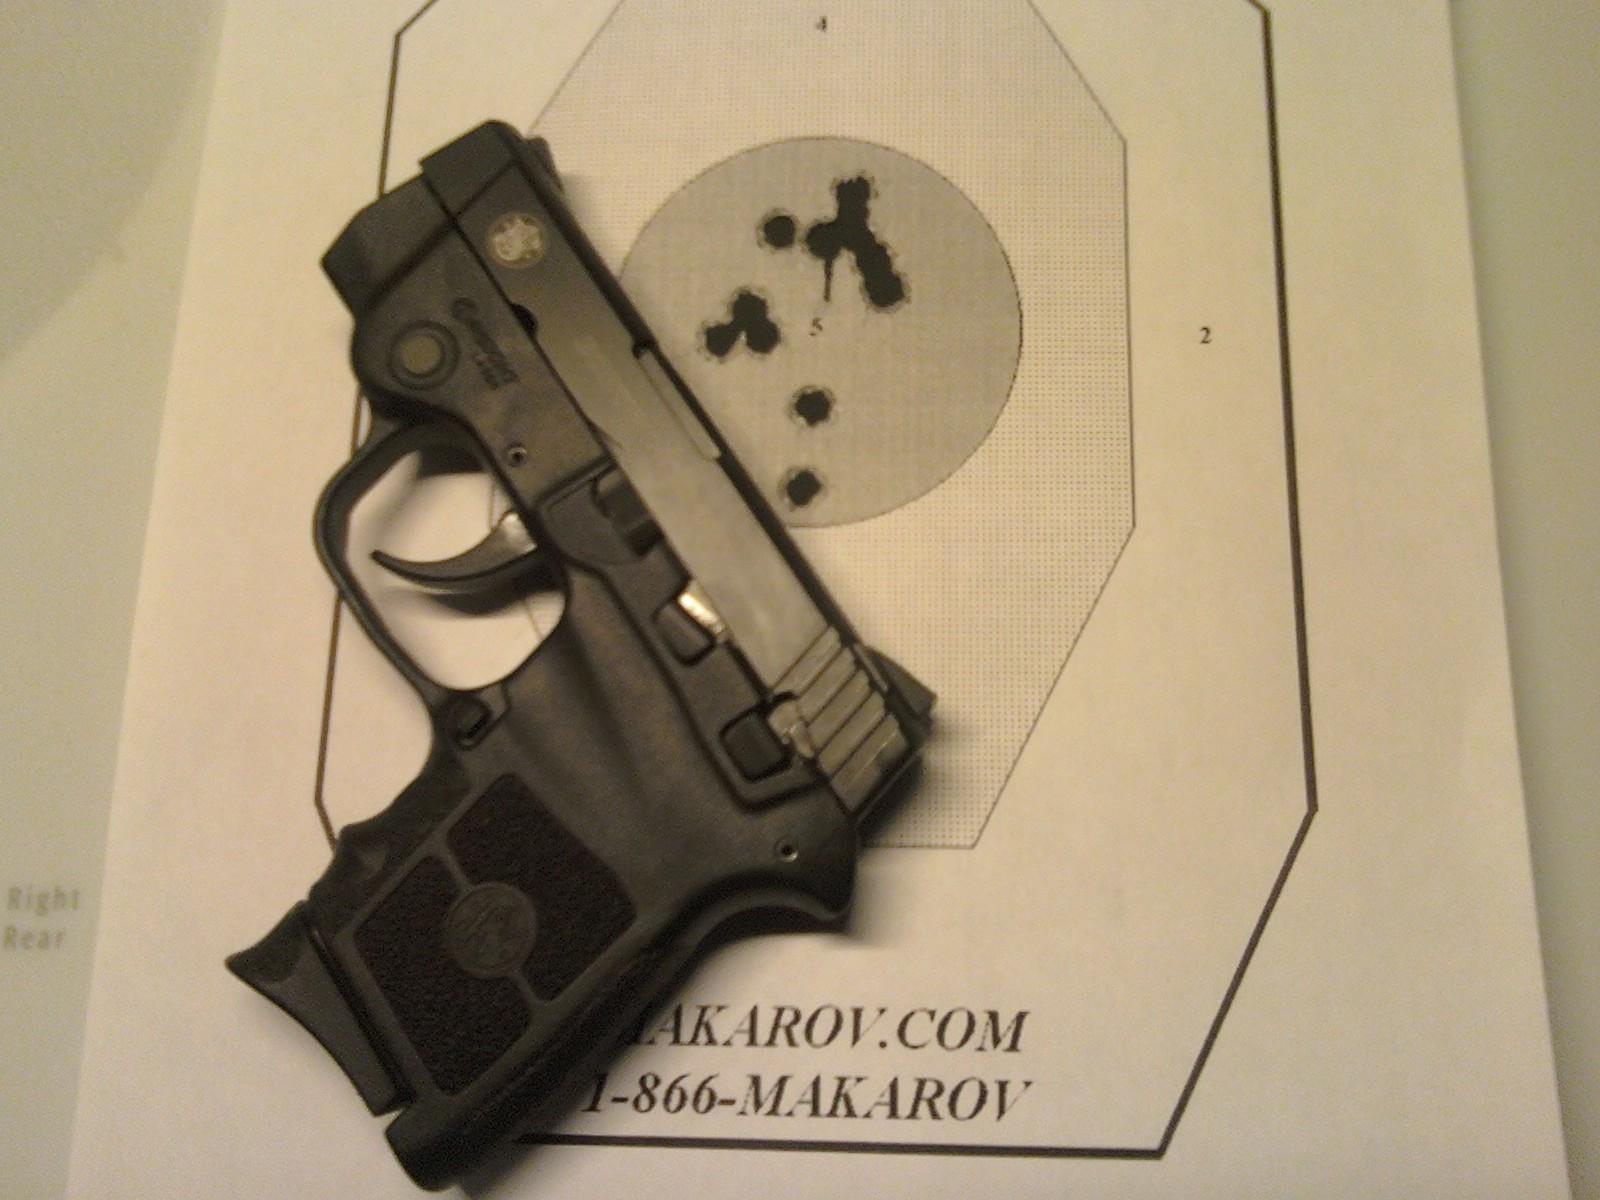 S&W Bodyguard .380 Range Report-1223001326-1-.jpg